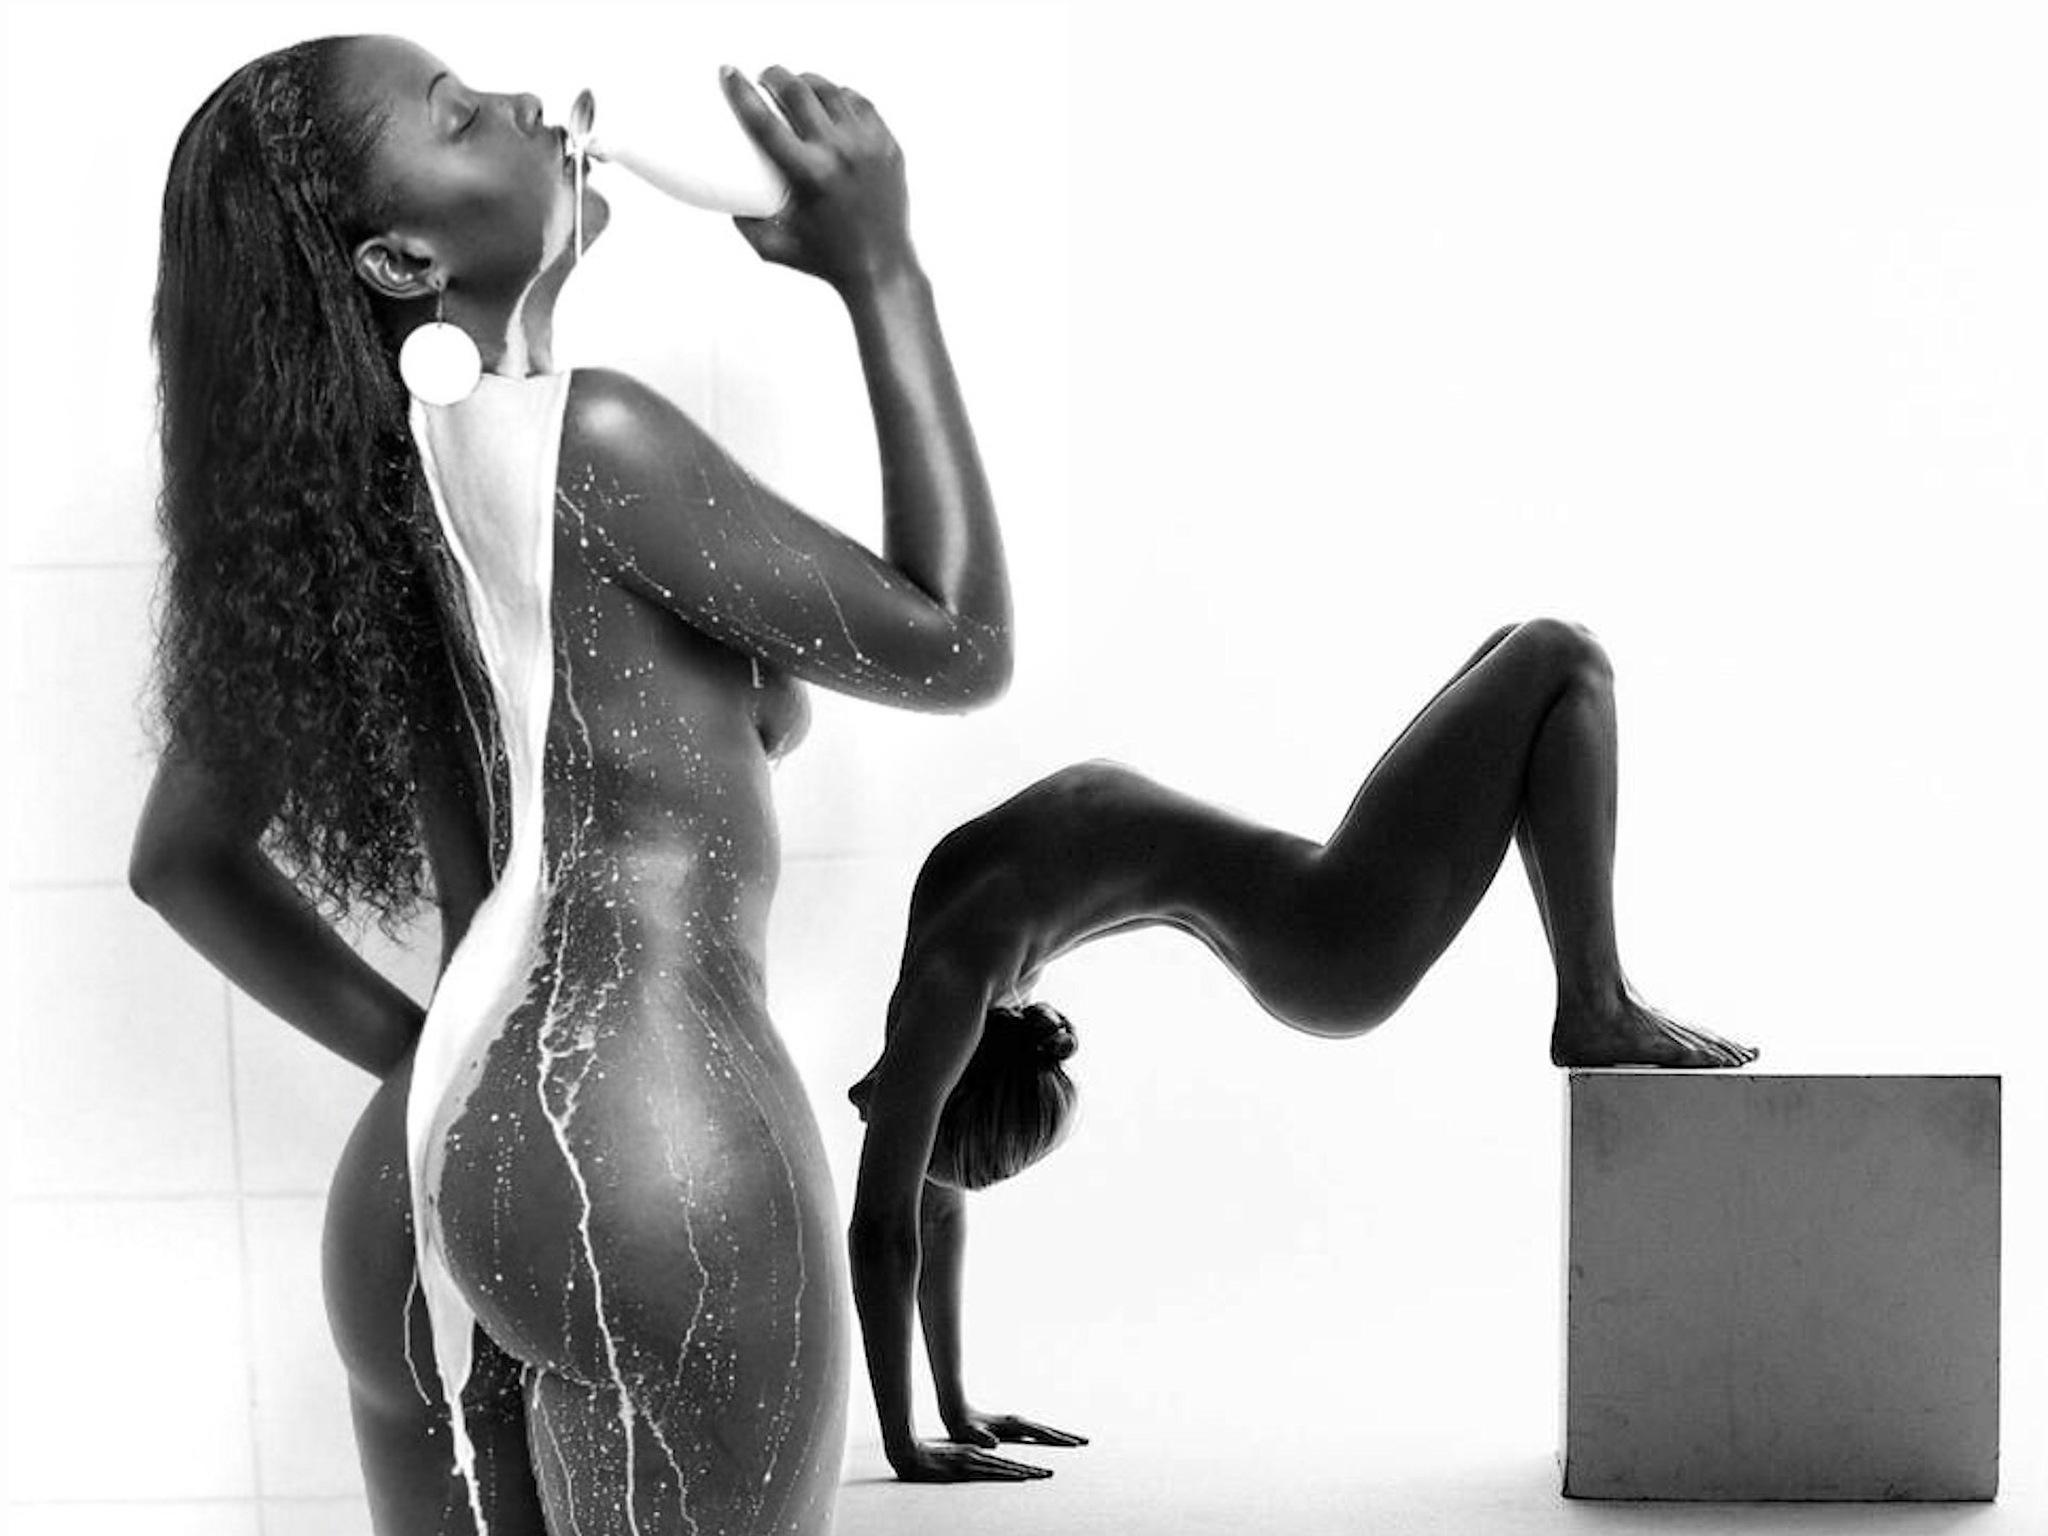 Healthy Desires by Alexandros Raskolnick